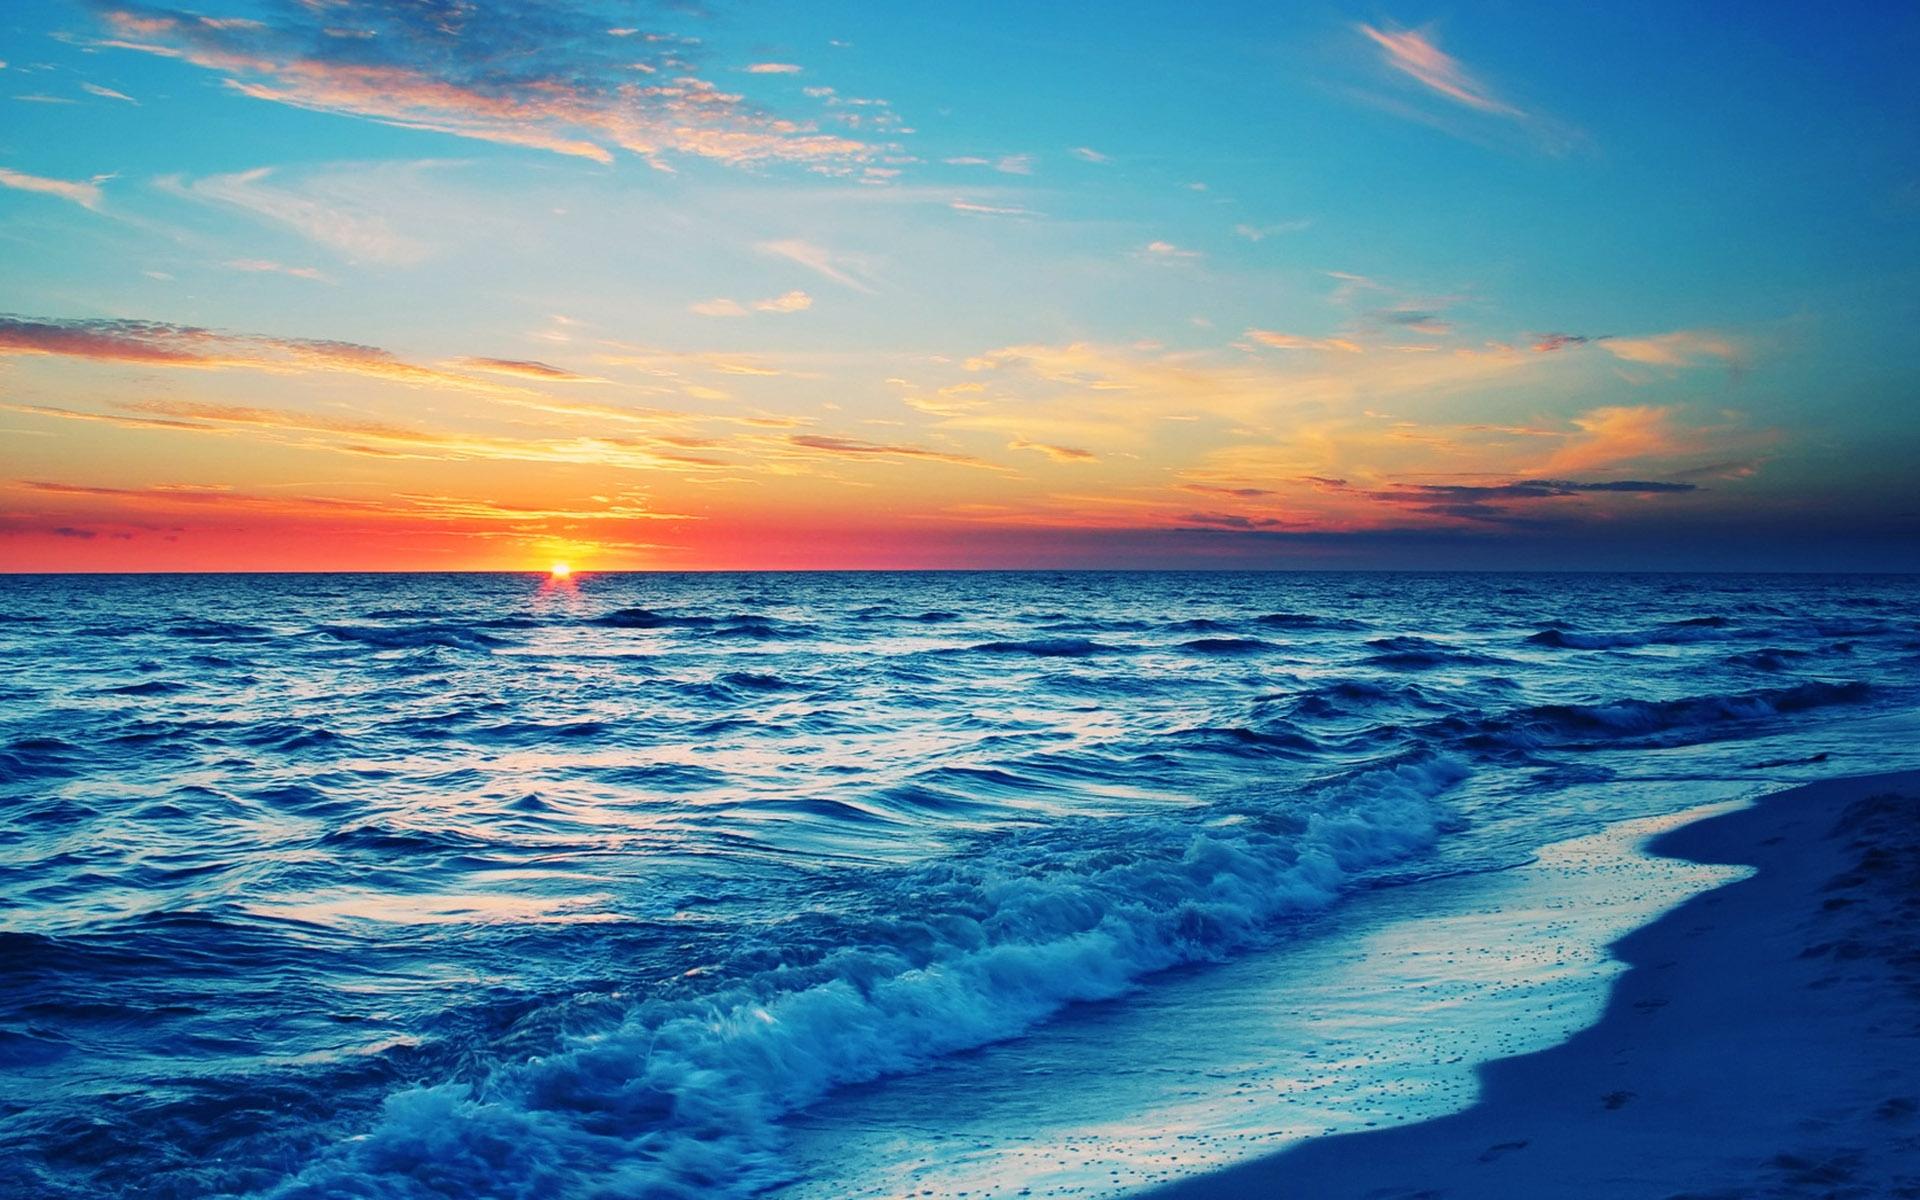 Beautiful Beach Landscape 19201200 120997 HD Wallpaper Res 1920x1200